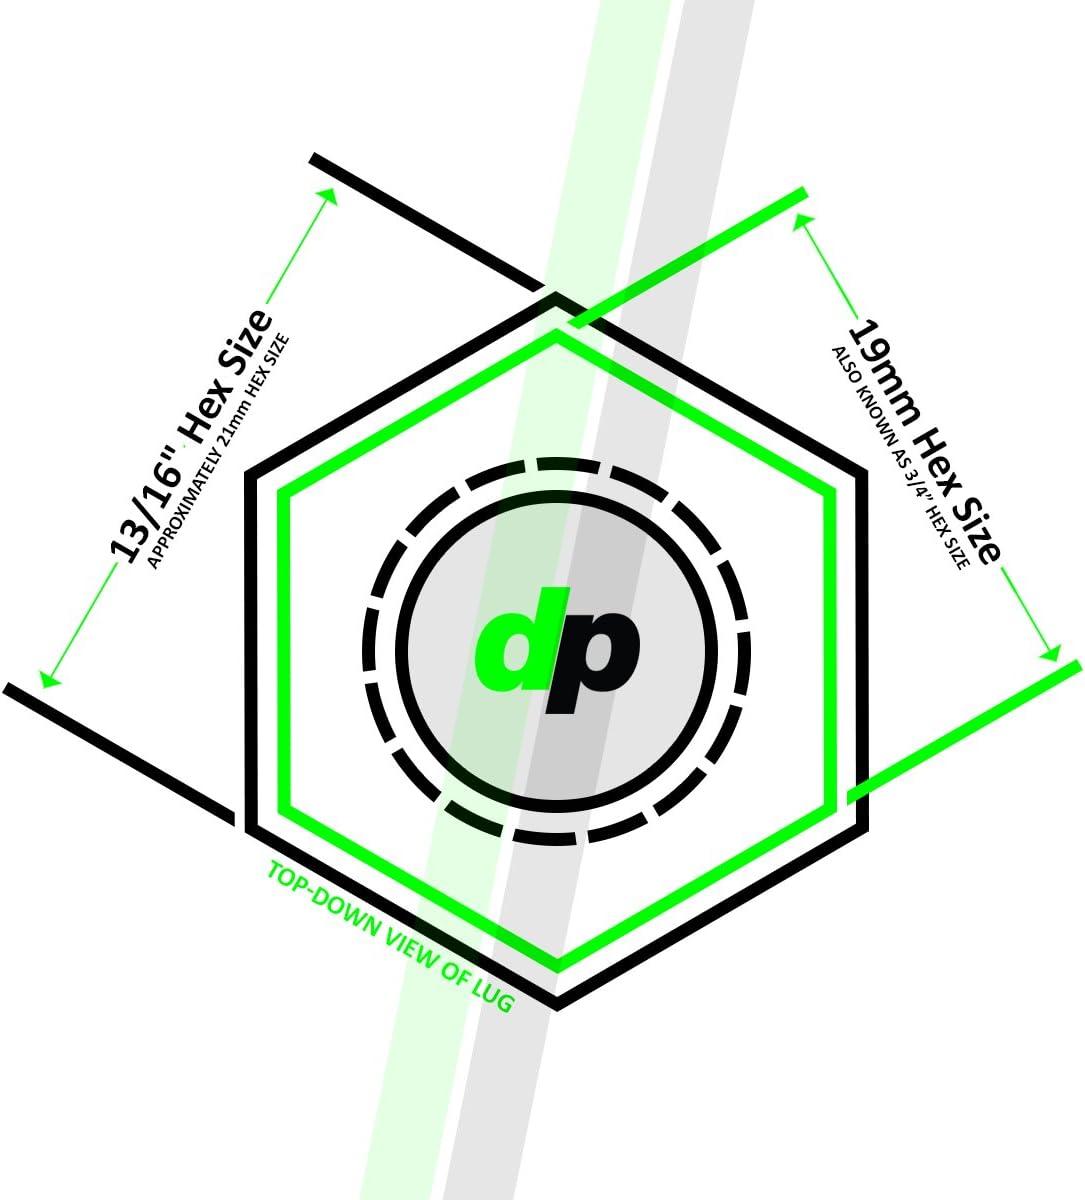 DPAccessories LCS3L5HC-CH04LK4 Chrome Wheel Locks 12x1.25 Closed End Spline Tuner Locking Lug Nuts Dual Hex Wheel Lock Set